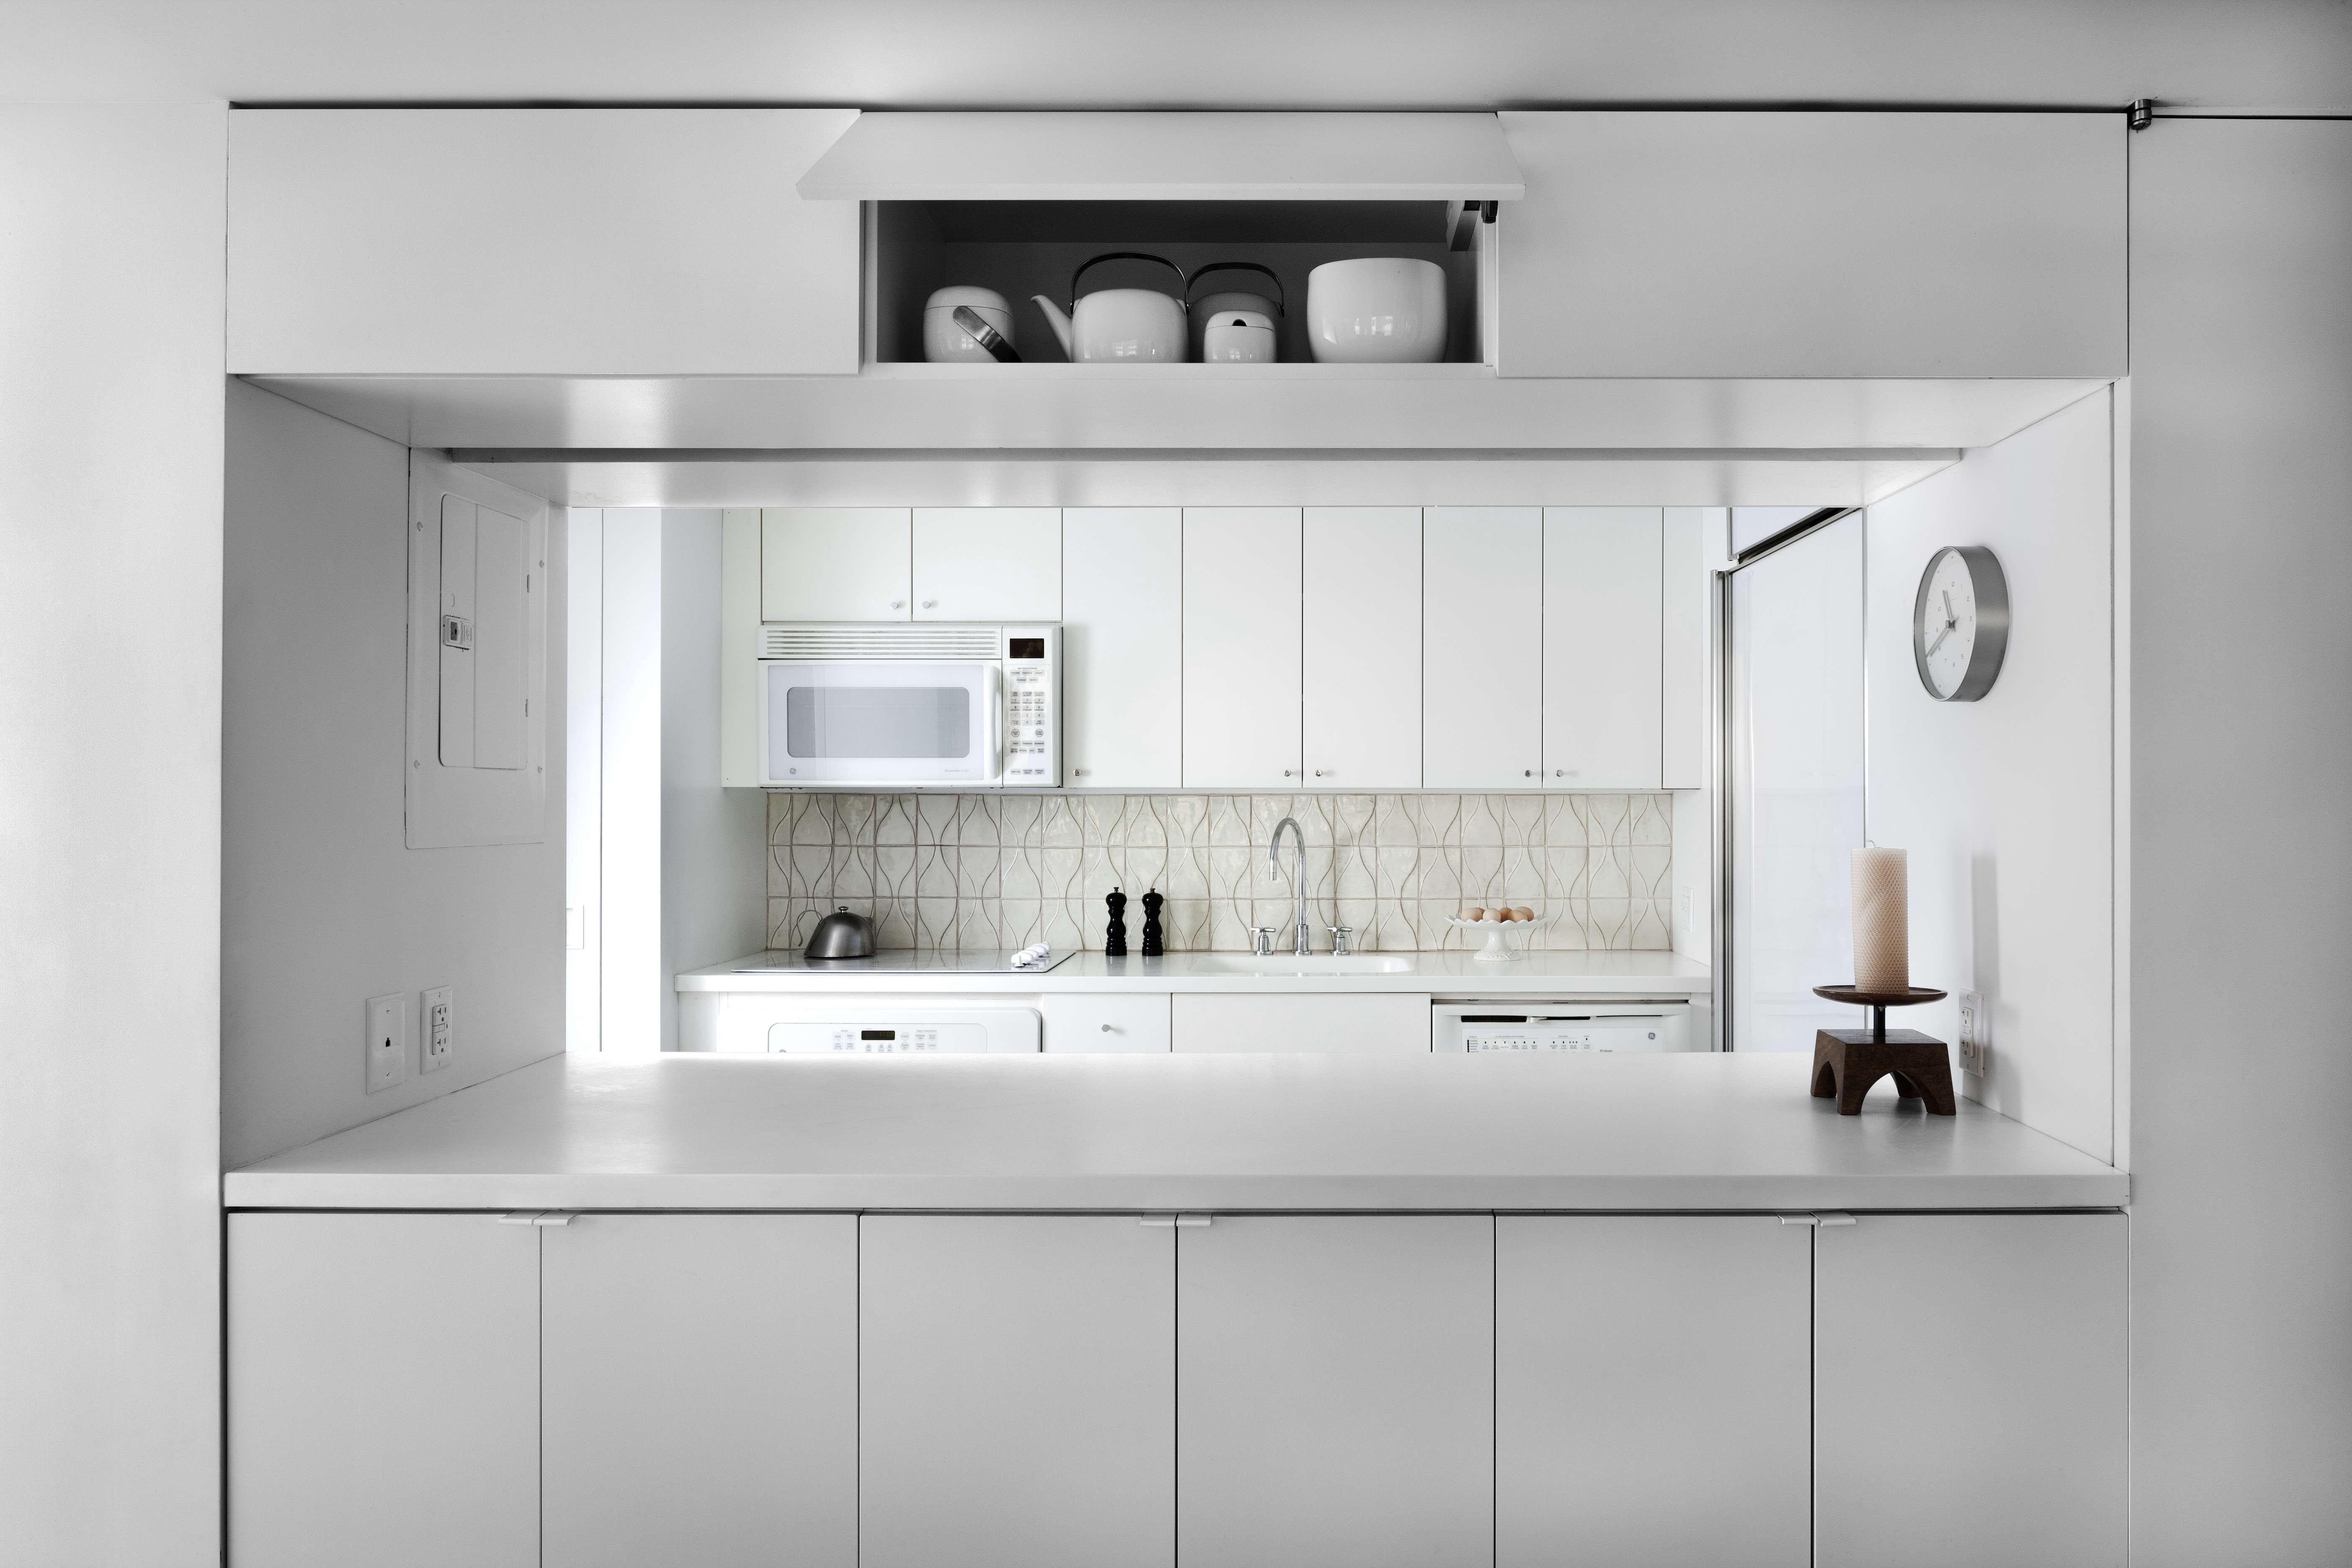 jennifer hanlin cobble hill apartment kitchen, photo by bruce buck 12